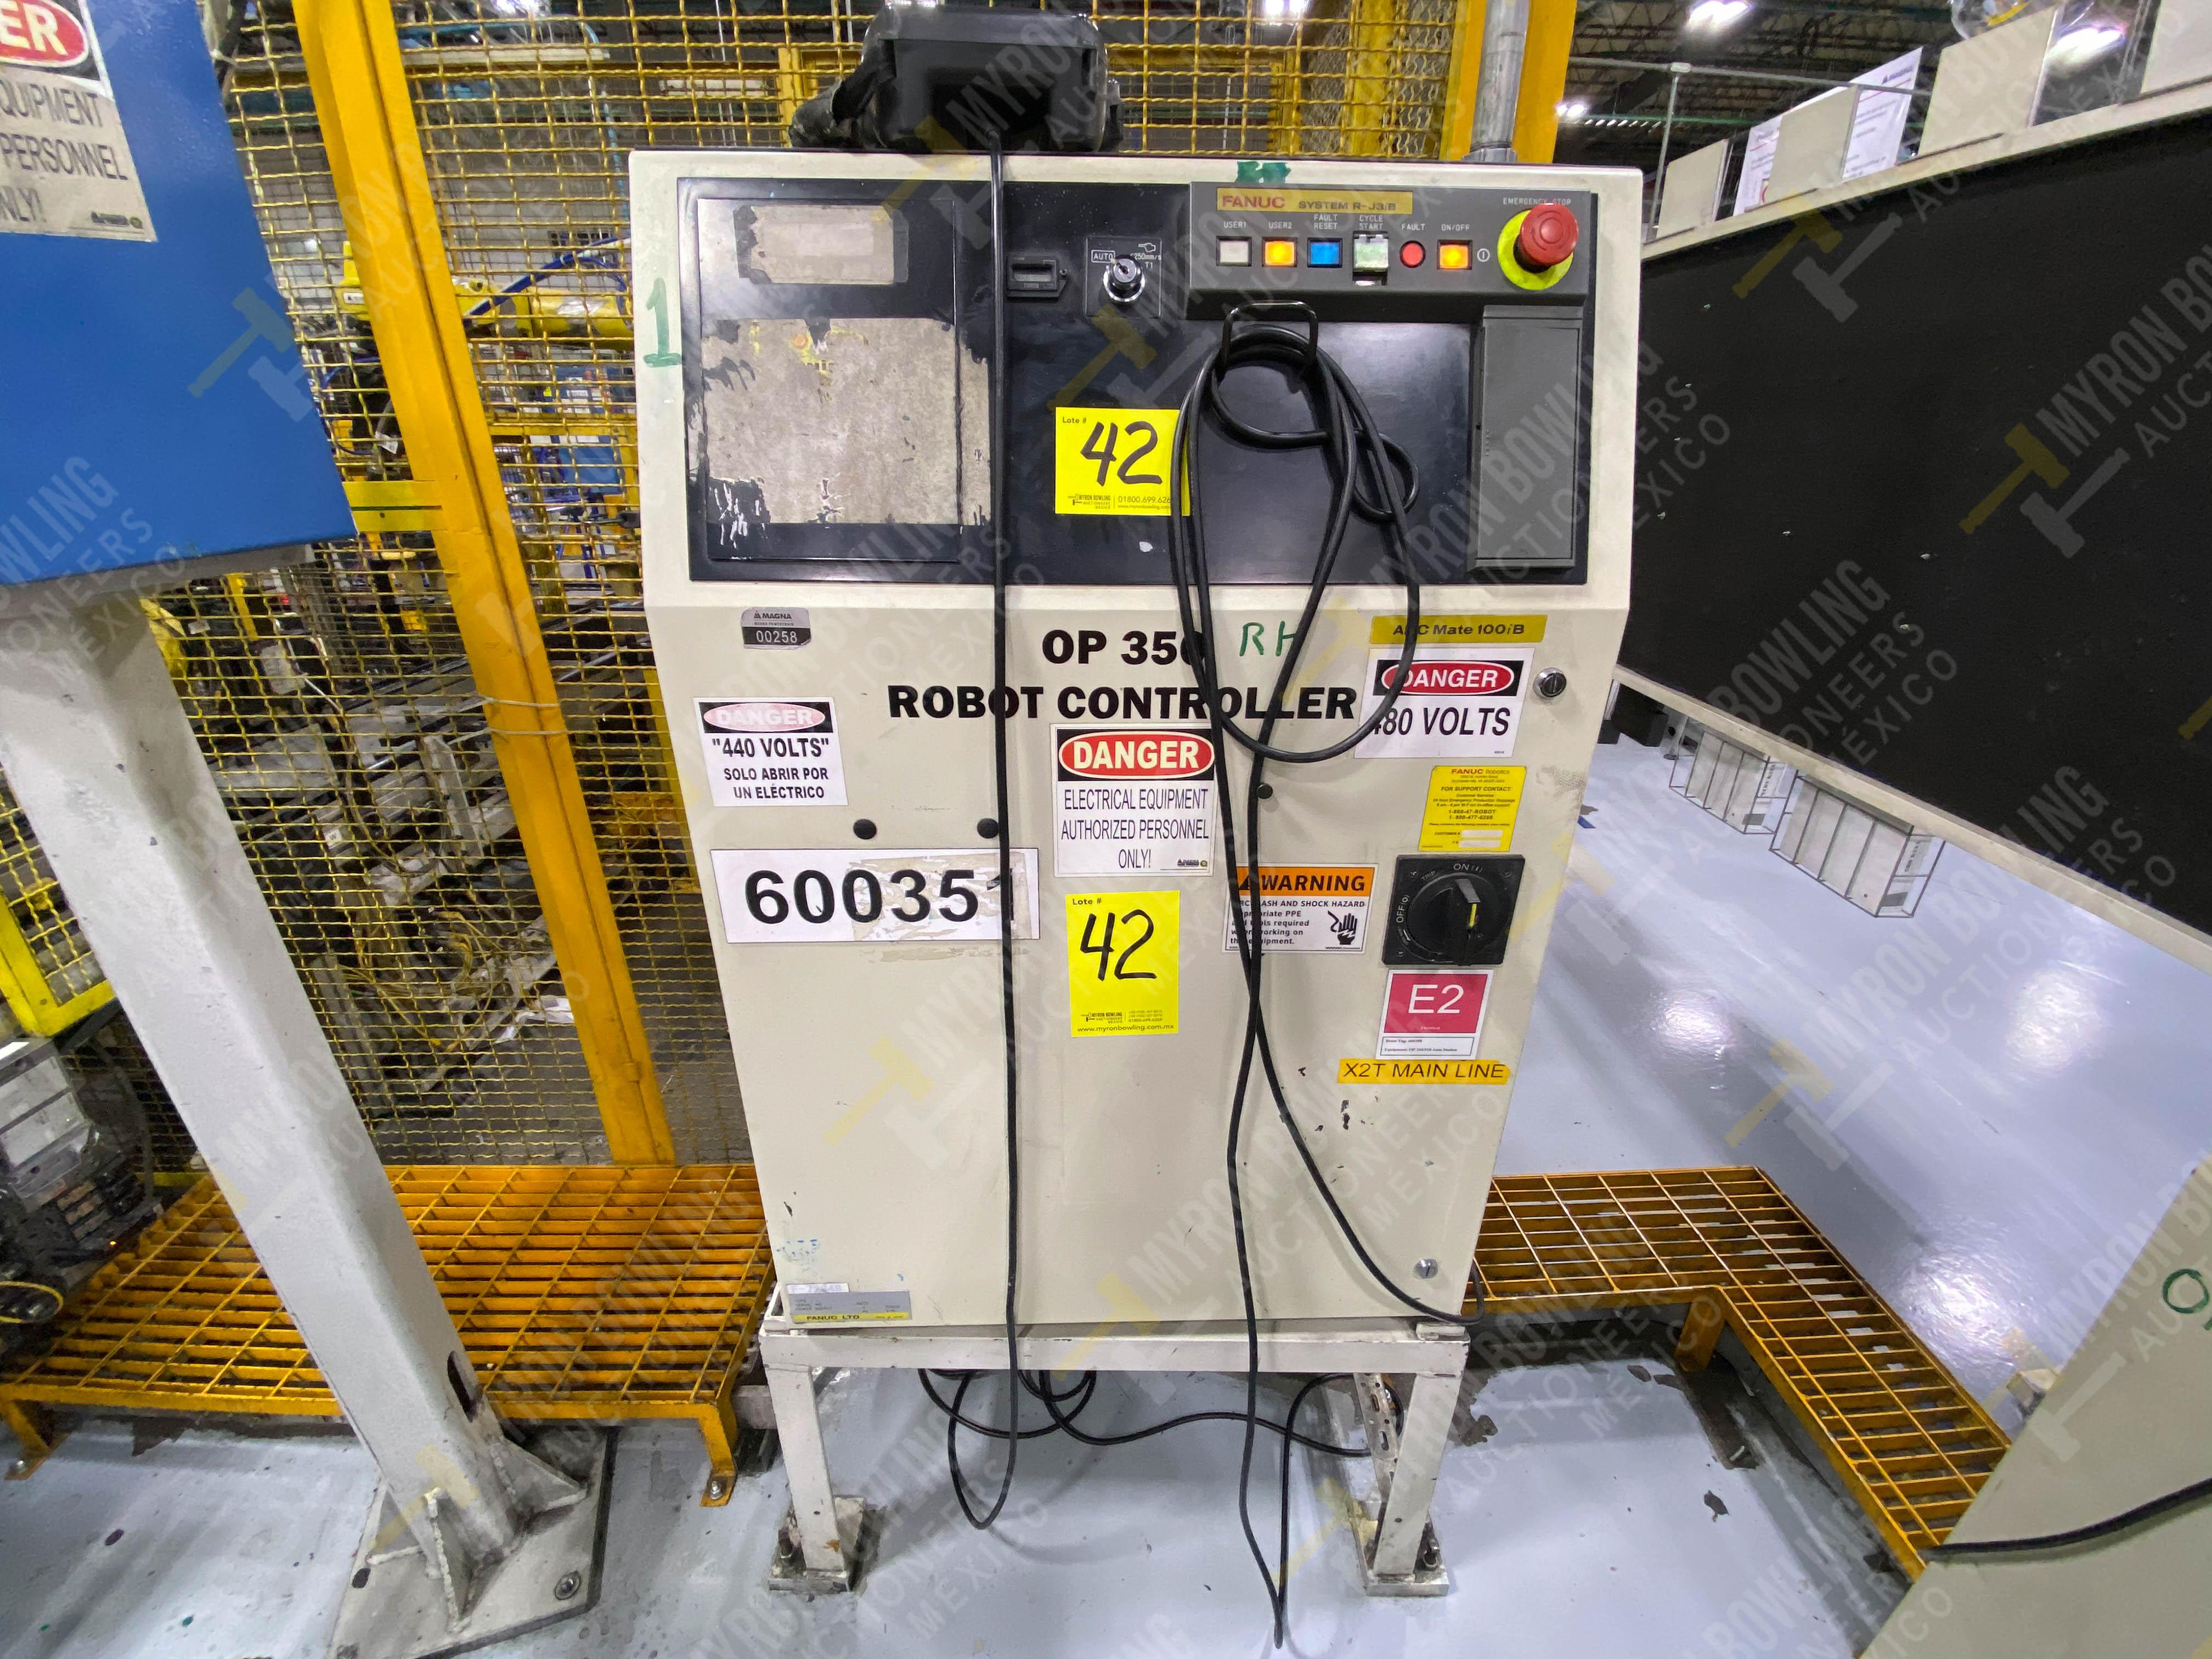 Robot marca Fanuc con capacidad de carga de 15-30 Kg, controlador de robot y teach pendant - Image 5 of 14